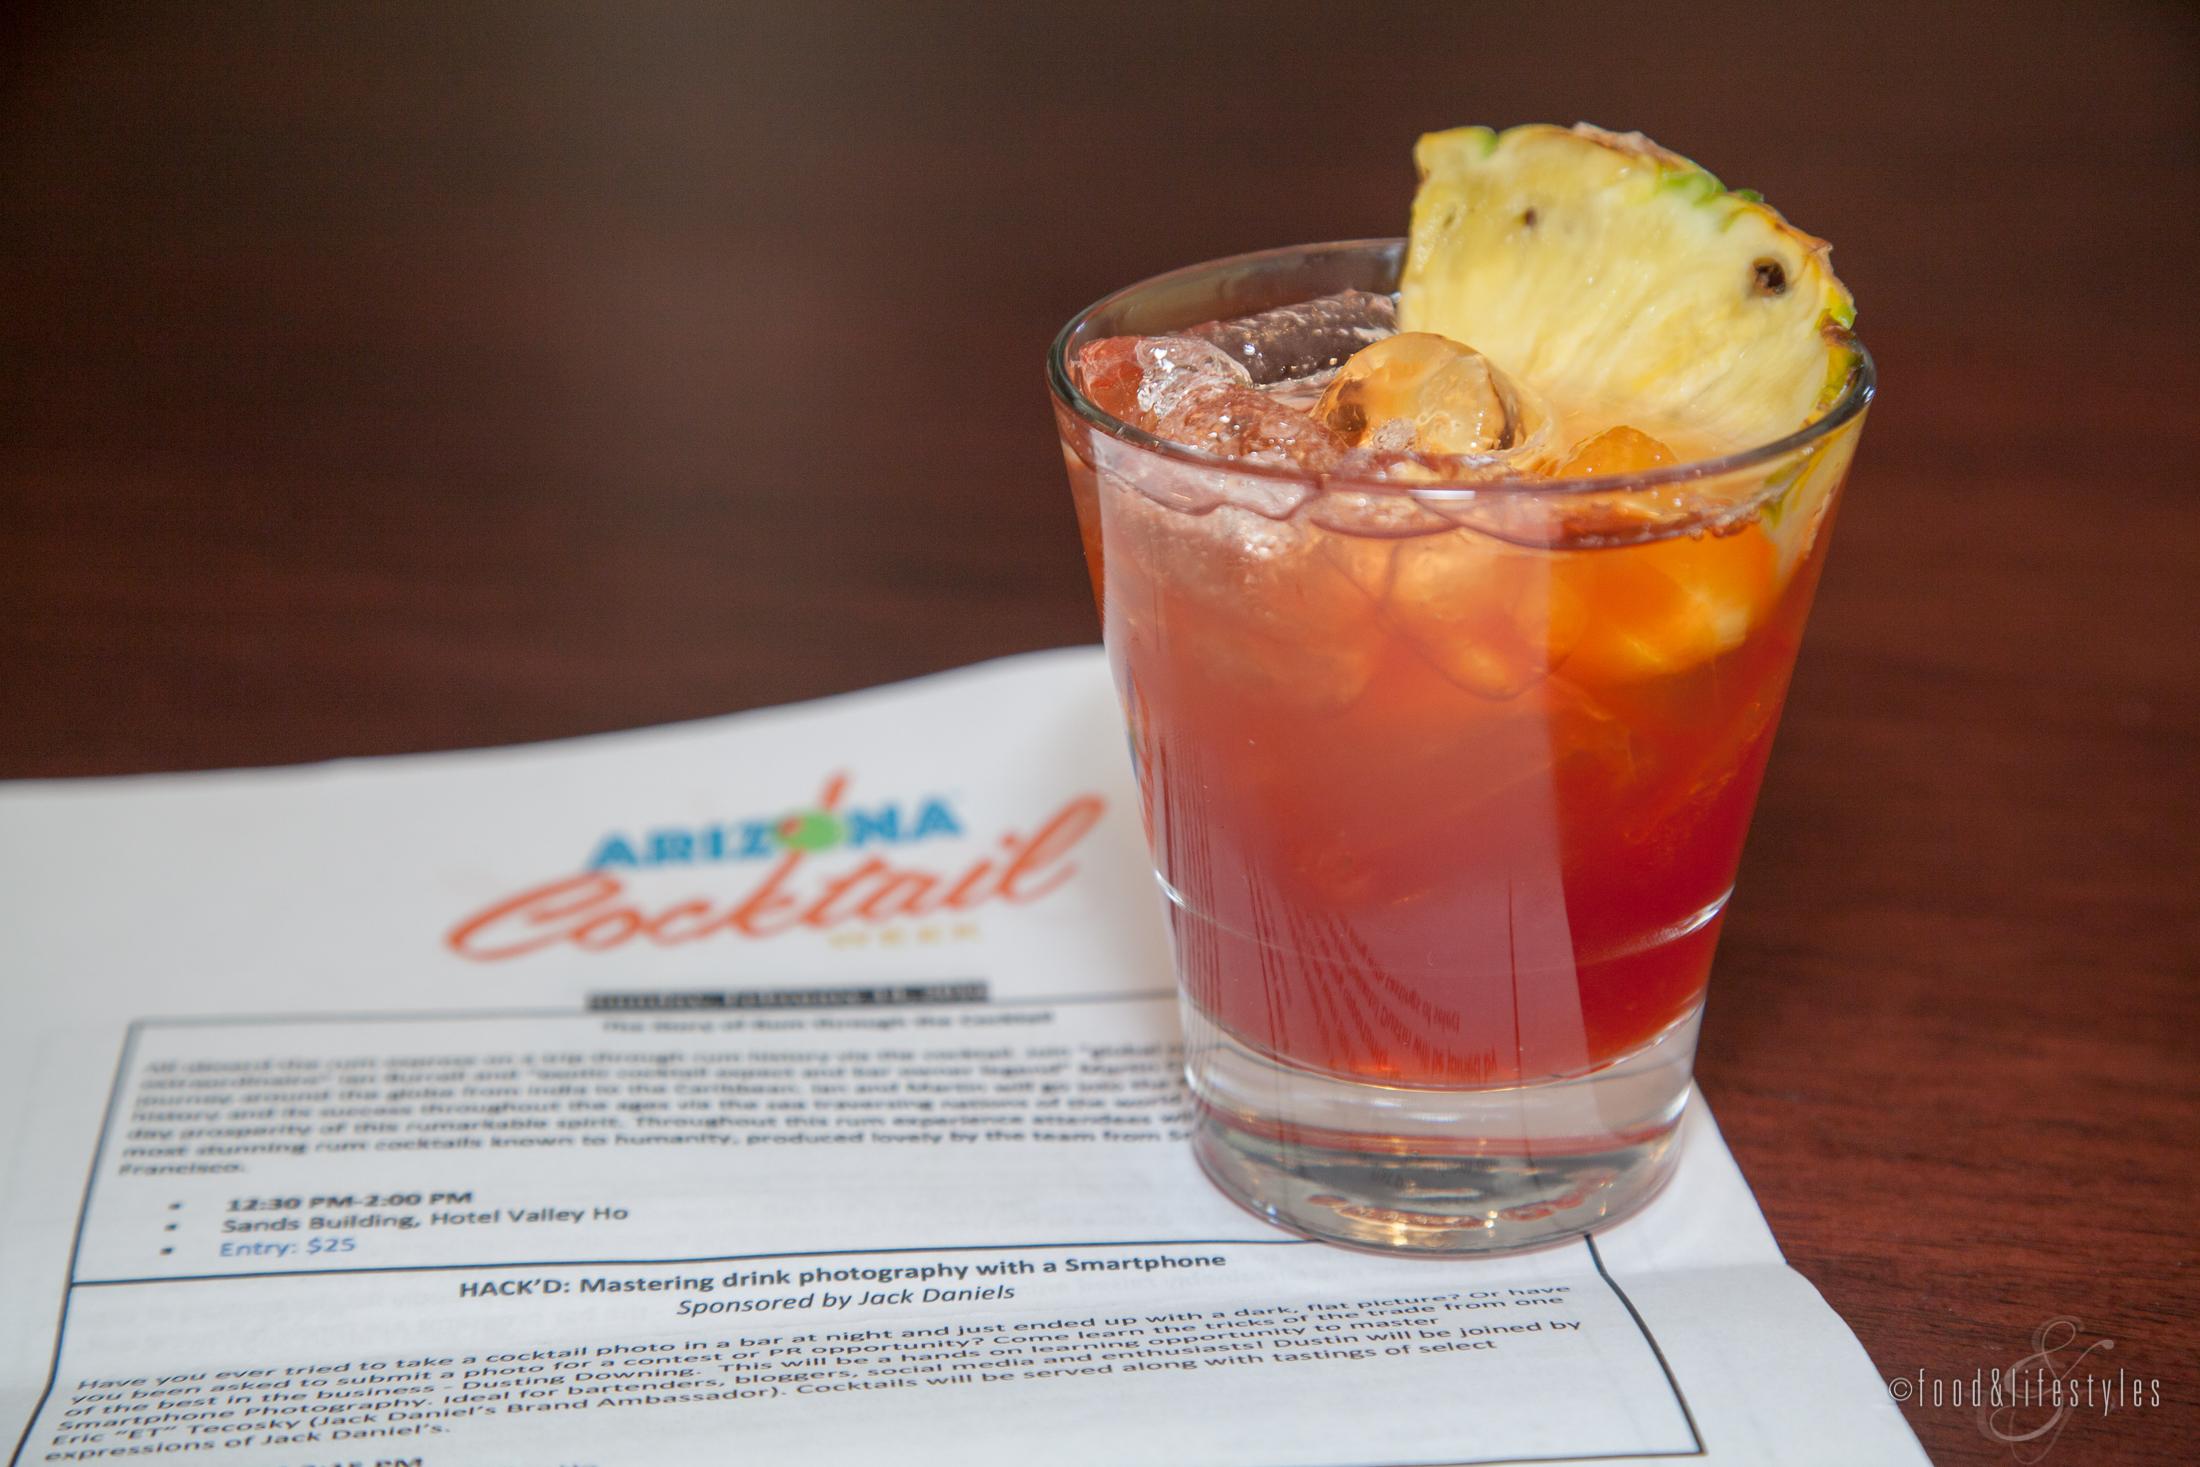 Arizona Cocktail Week 2016